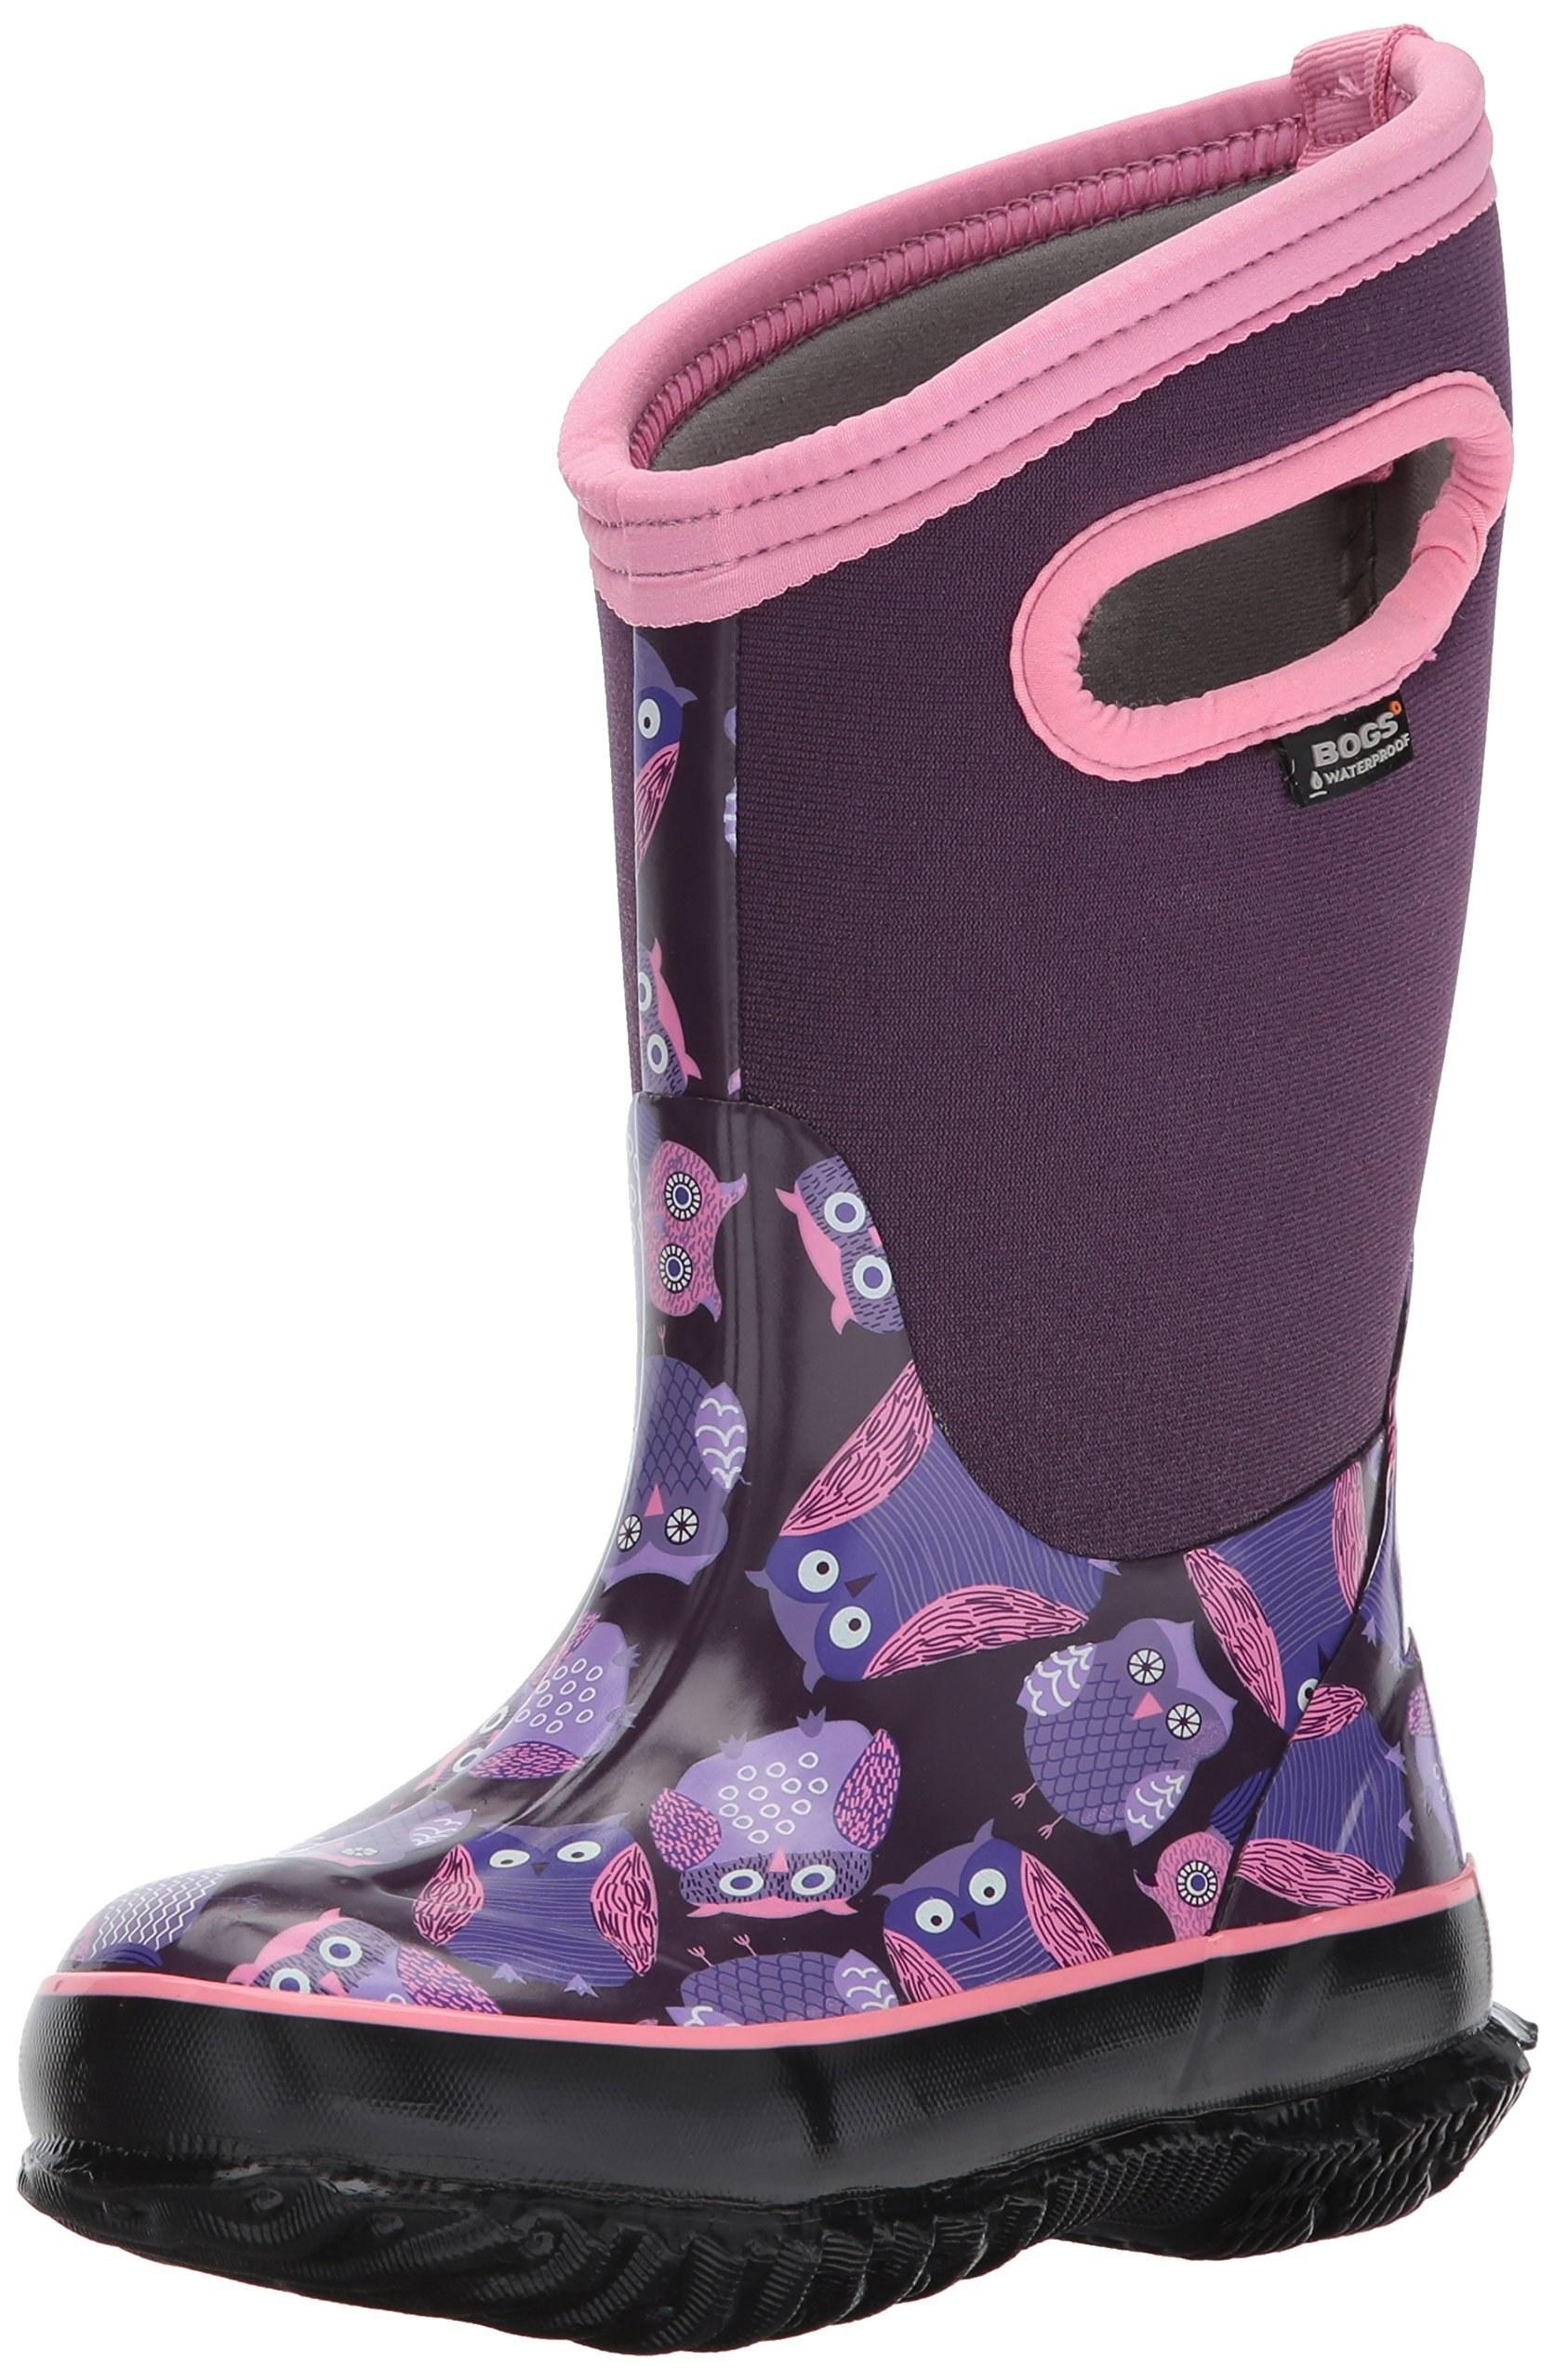 be5c55178d لیست قیمت Merrell Snow Quest Lite Waterproof Snow Boot (Little Kid ...